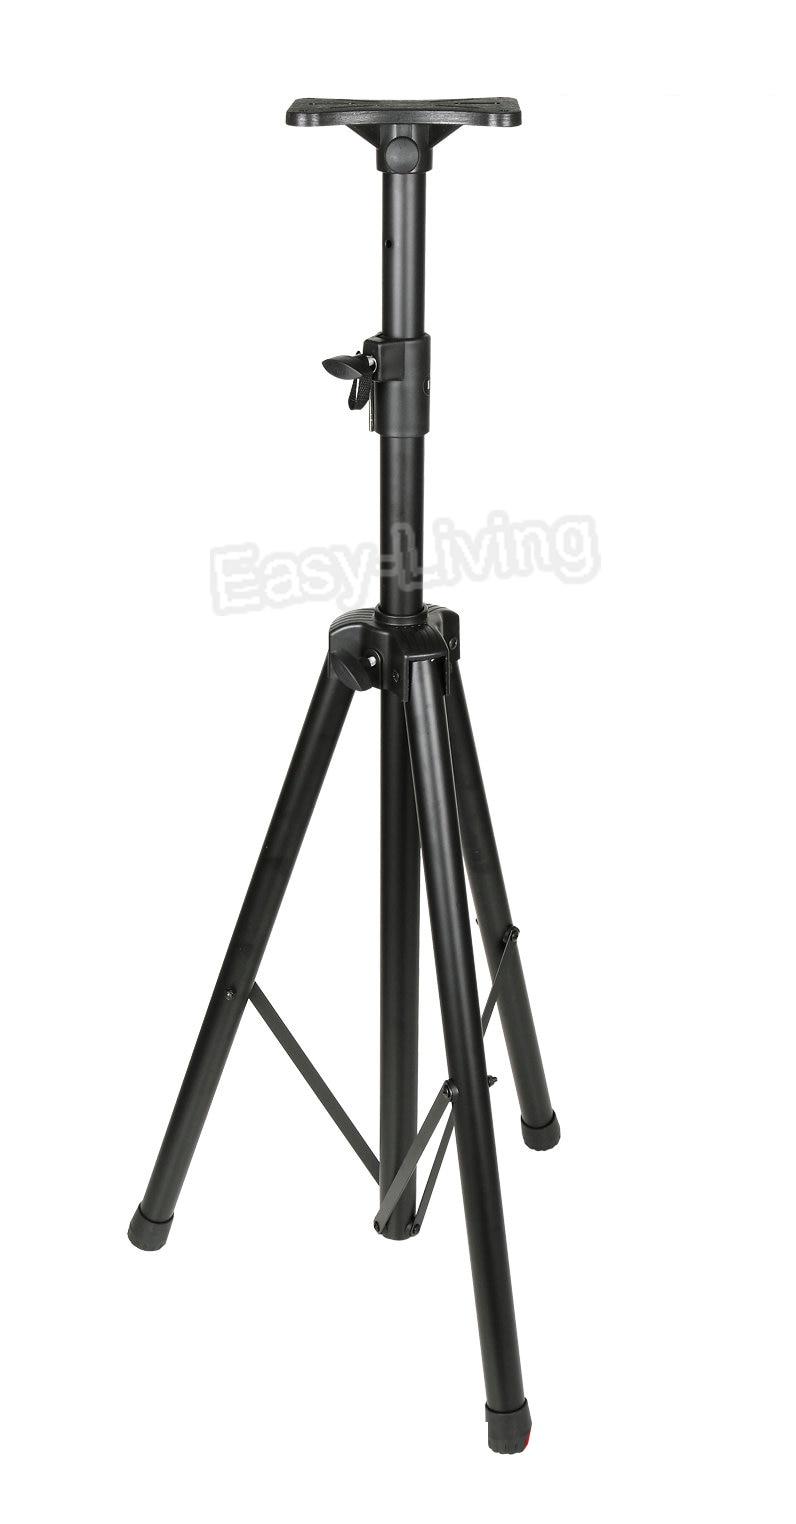 BL TY180 Universal Folding Projector Stand Tripod Speaker